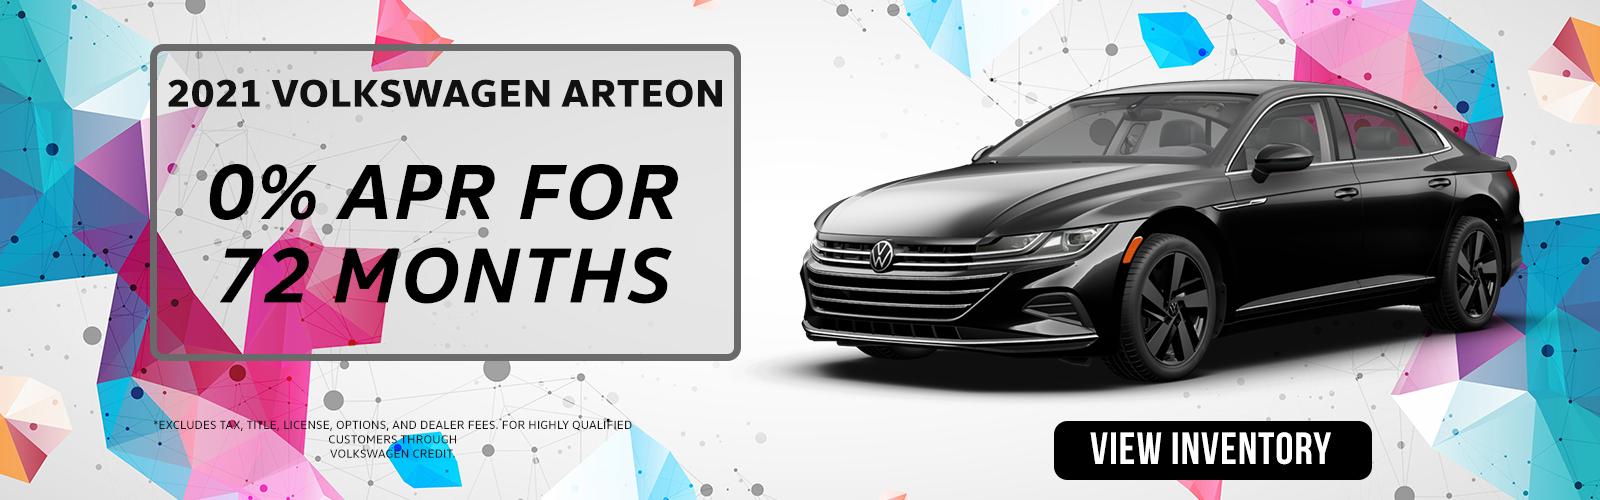 2021 Arteon 0% ARP 72 mt Ide VW